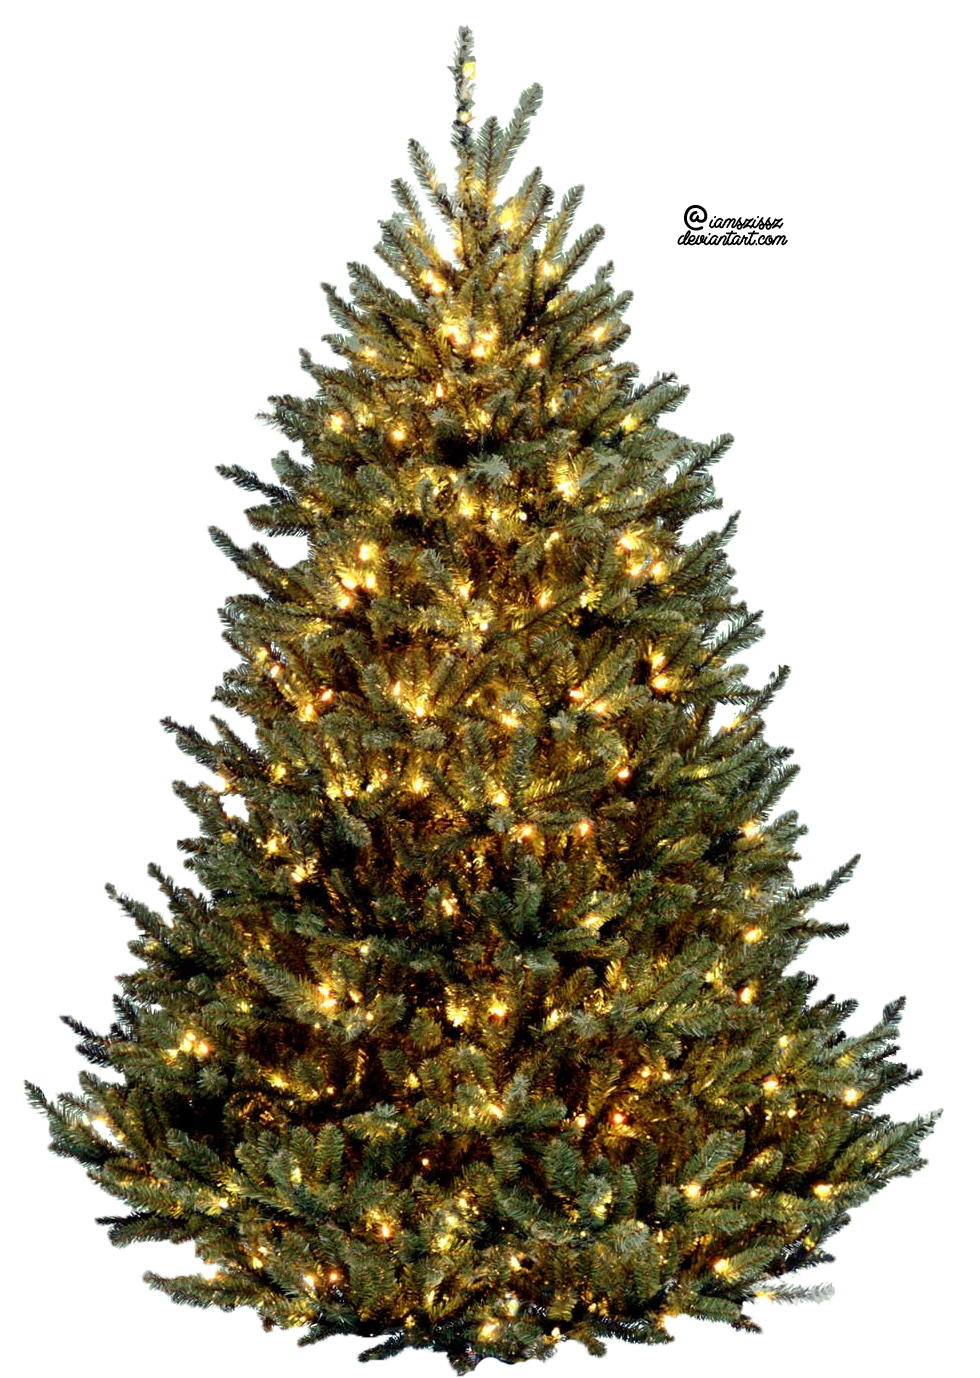 Fern clipart christmas tree. Xmas png by iamszissz